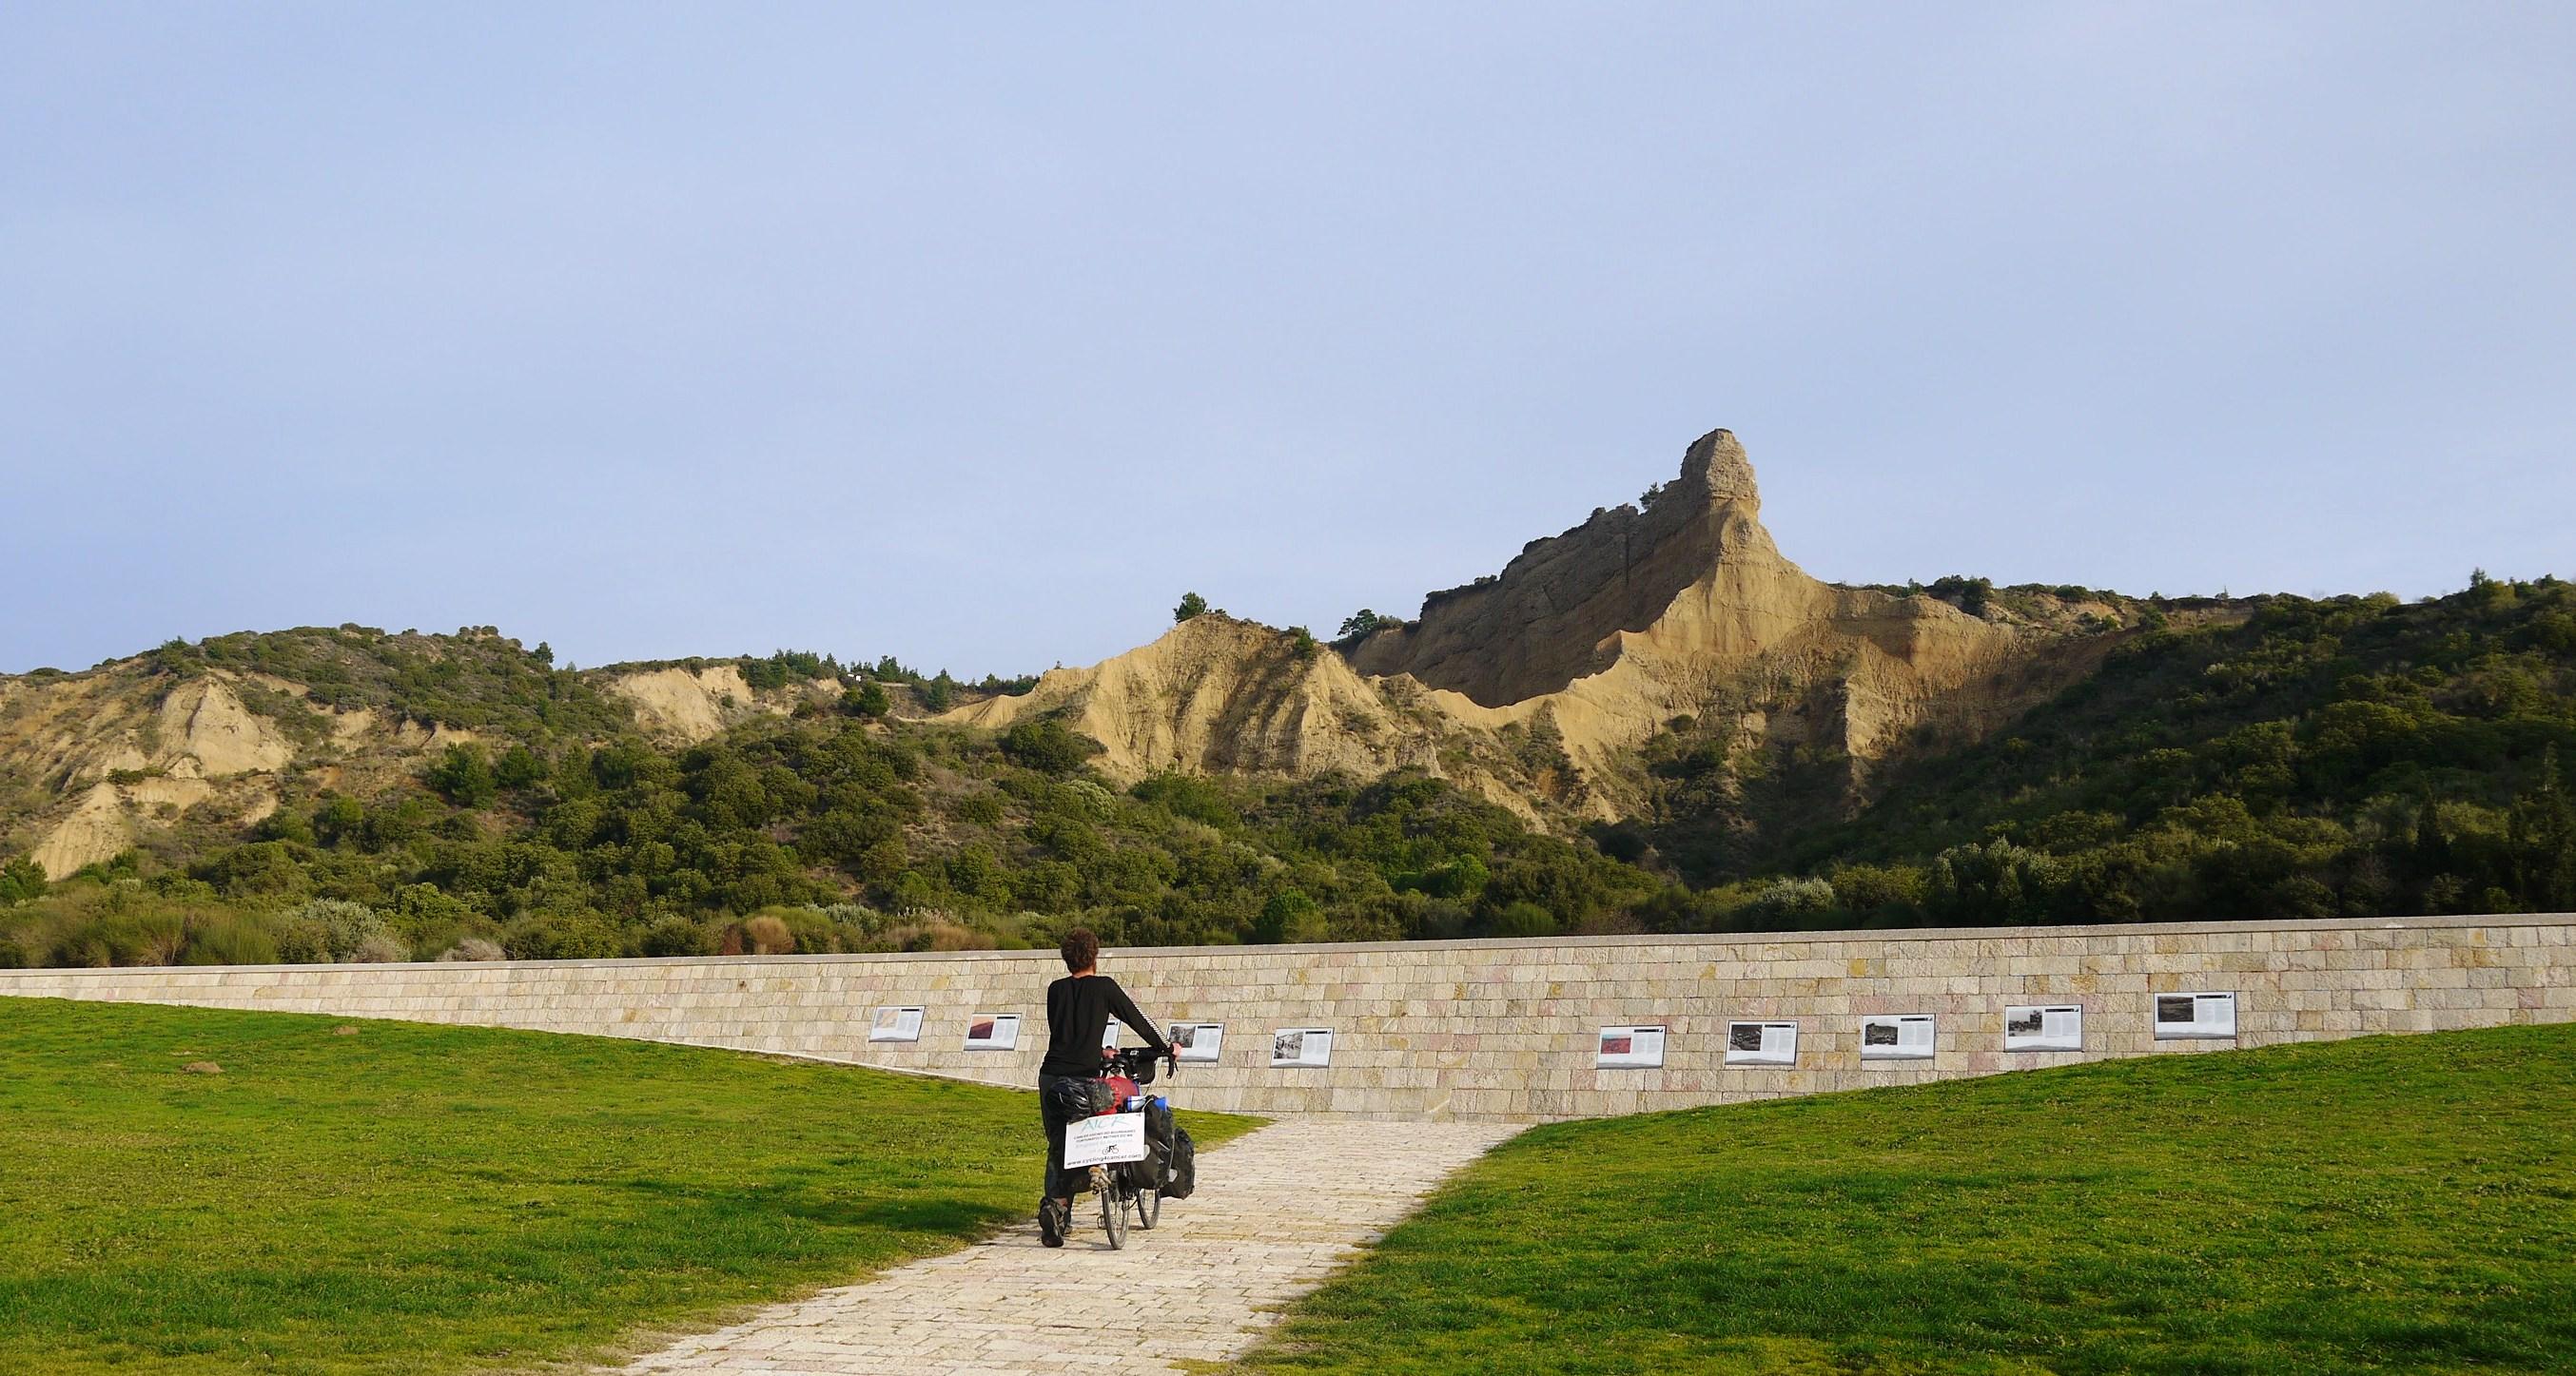 gallipoli cycling cancer walking upwards from anzac cove